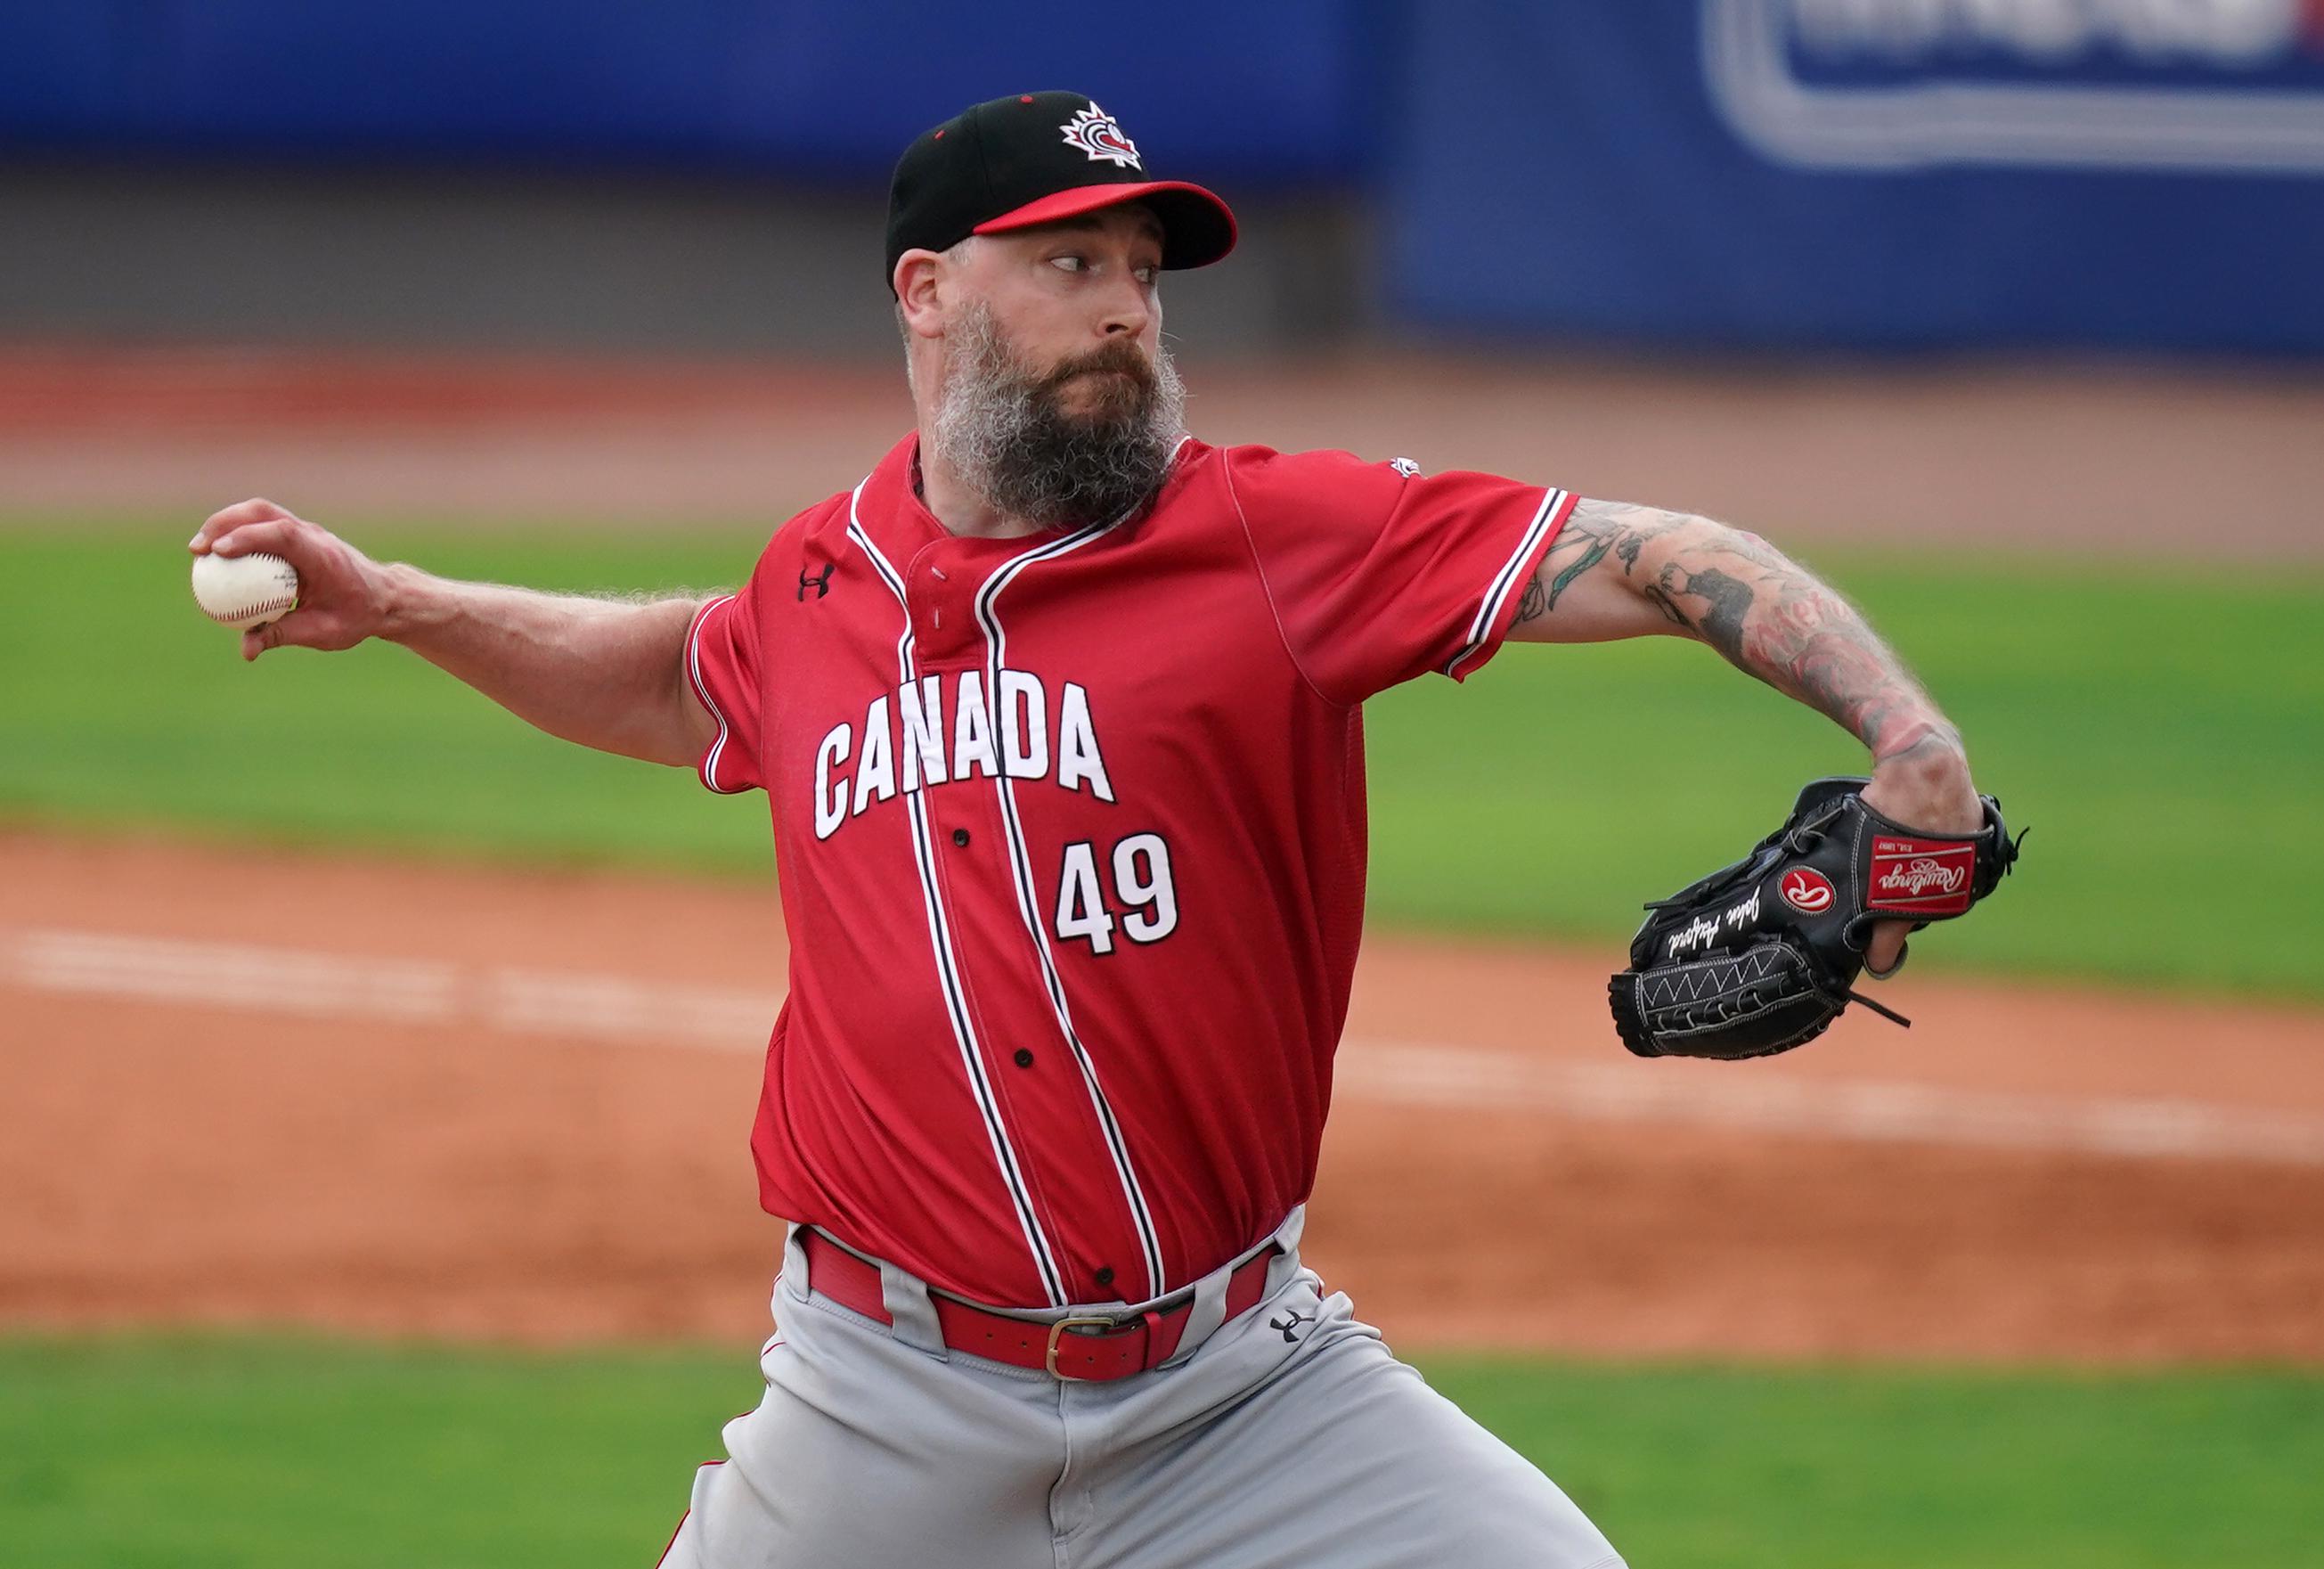 Baseball: WBSC Baseball Americas Qualifier-Canada at Dominica